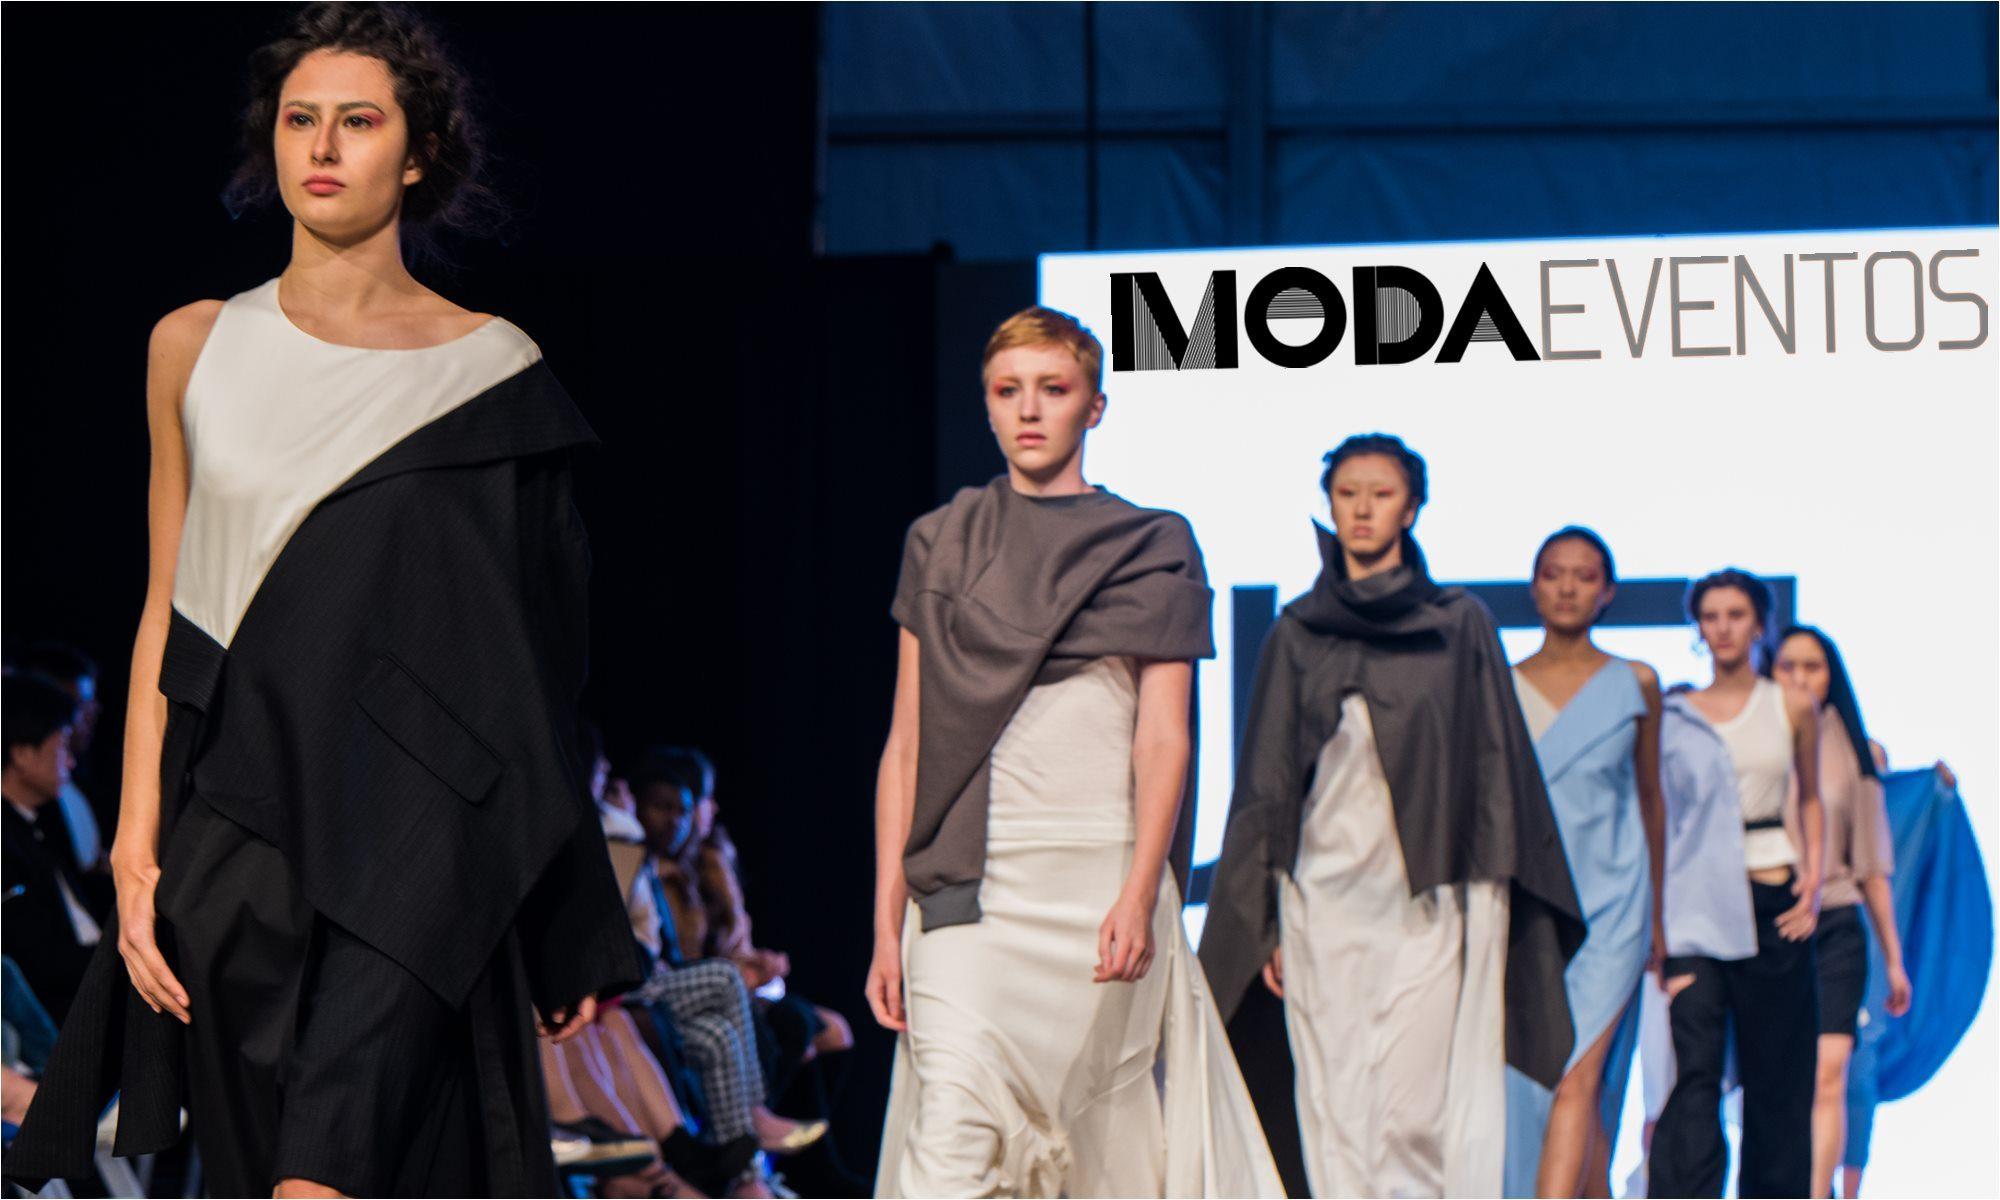 Moda Eventos by Fábio Juchen. Coberturas de Eventos de Moda